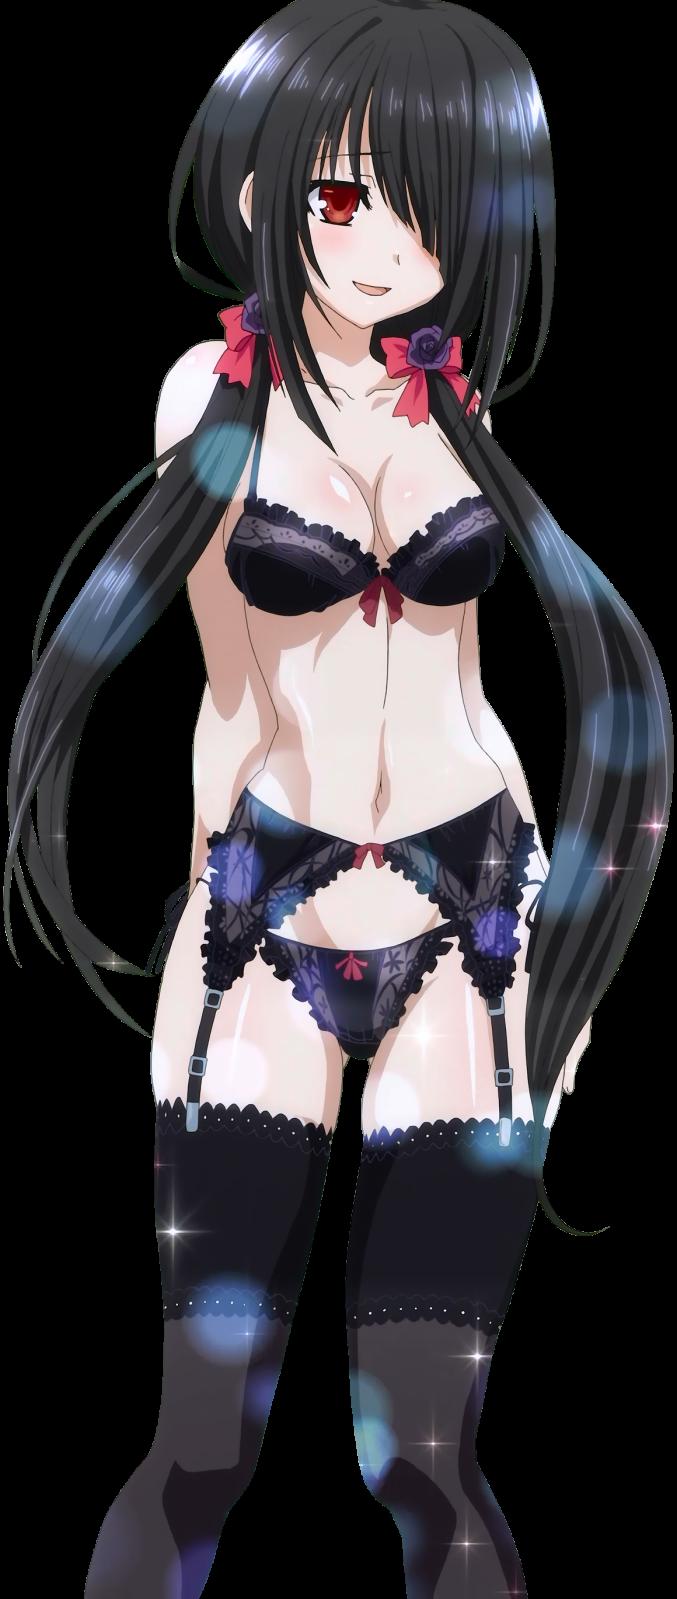 Kurumi tokisaki porno